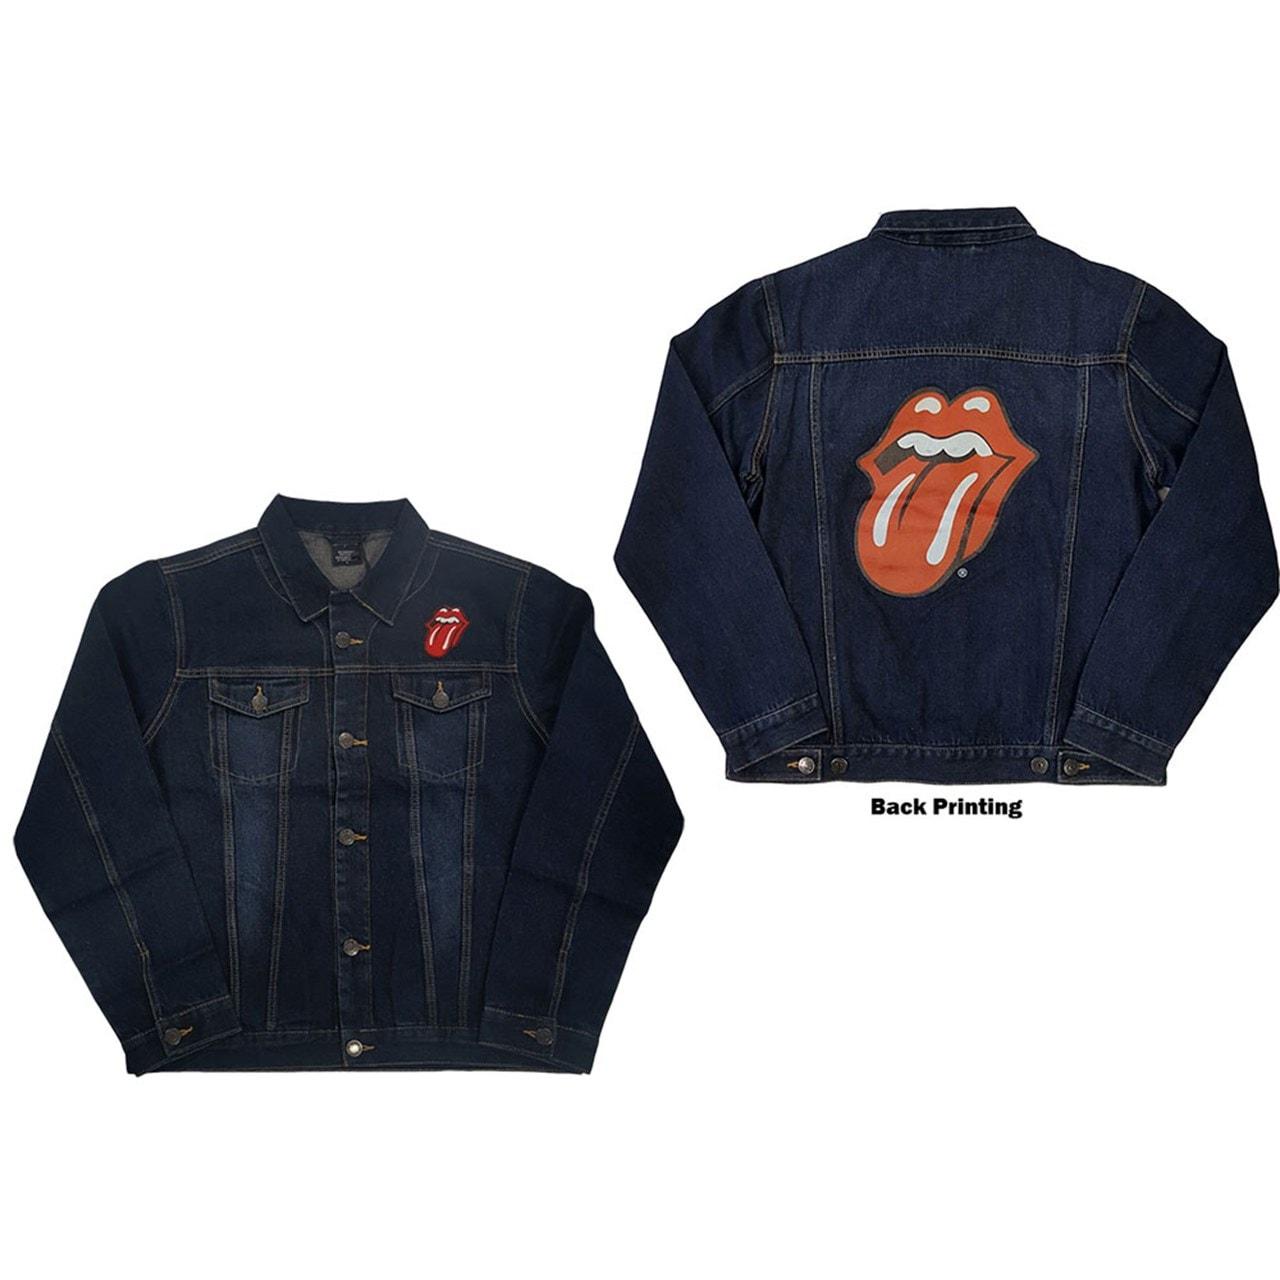 Rolling Stones Classic Tongue Denim Jacket (Small) - 1